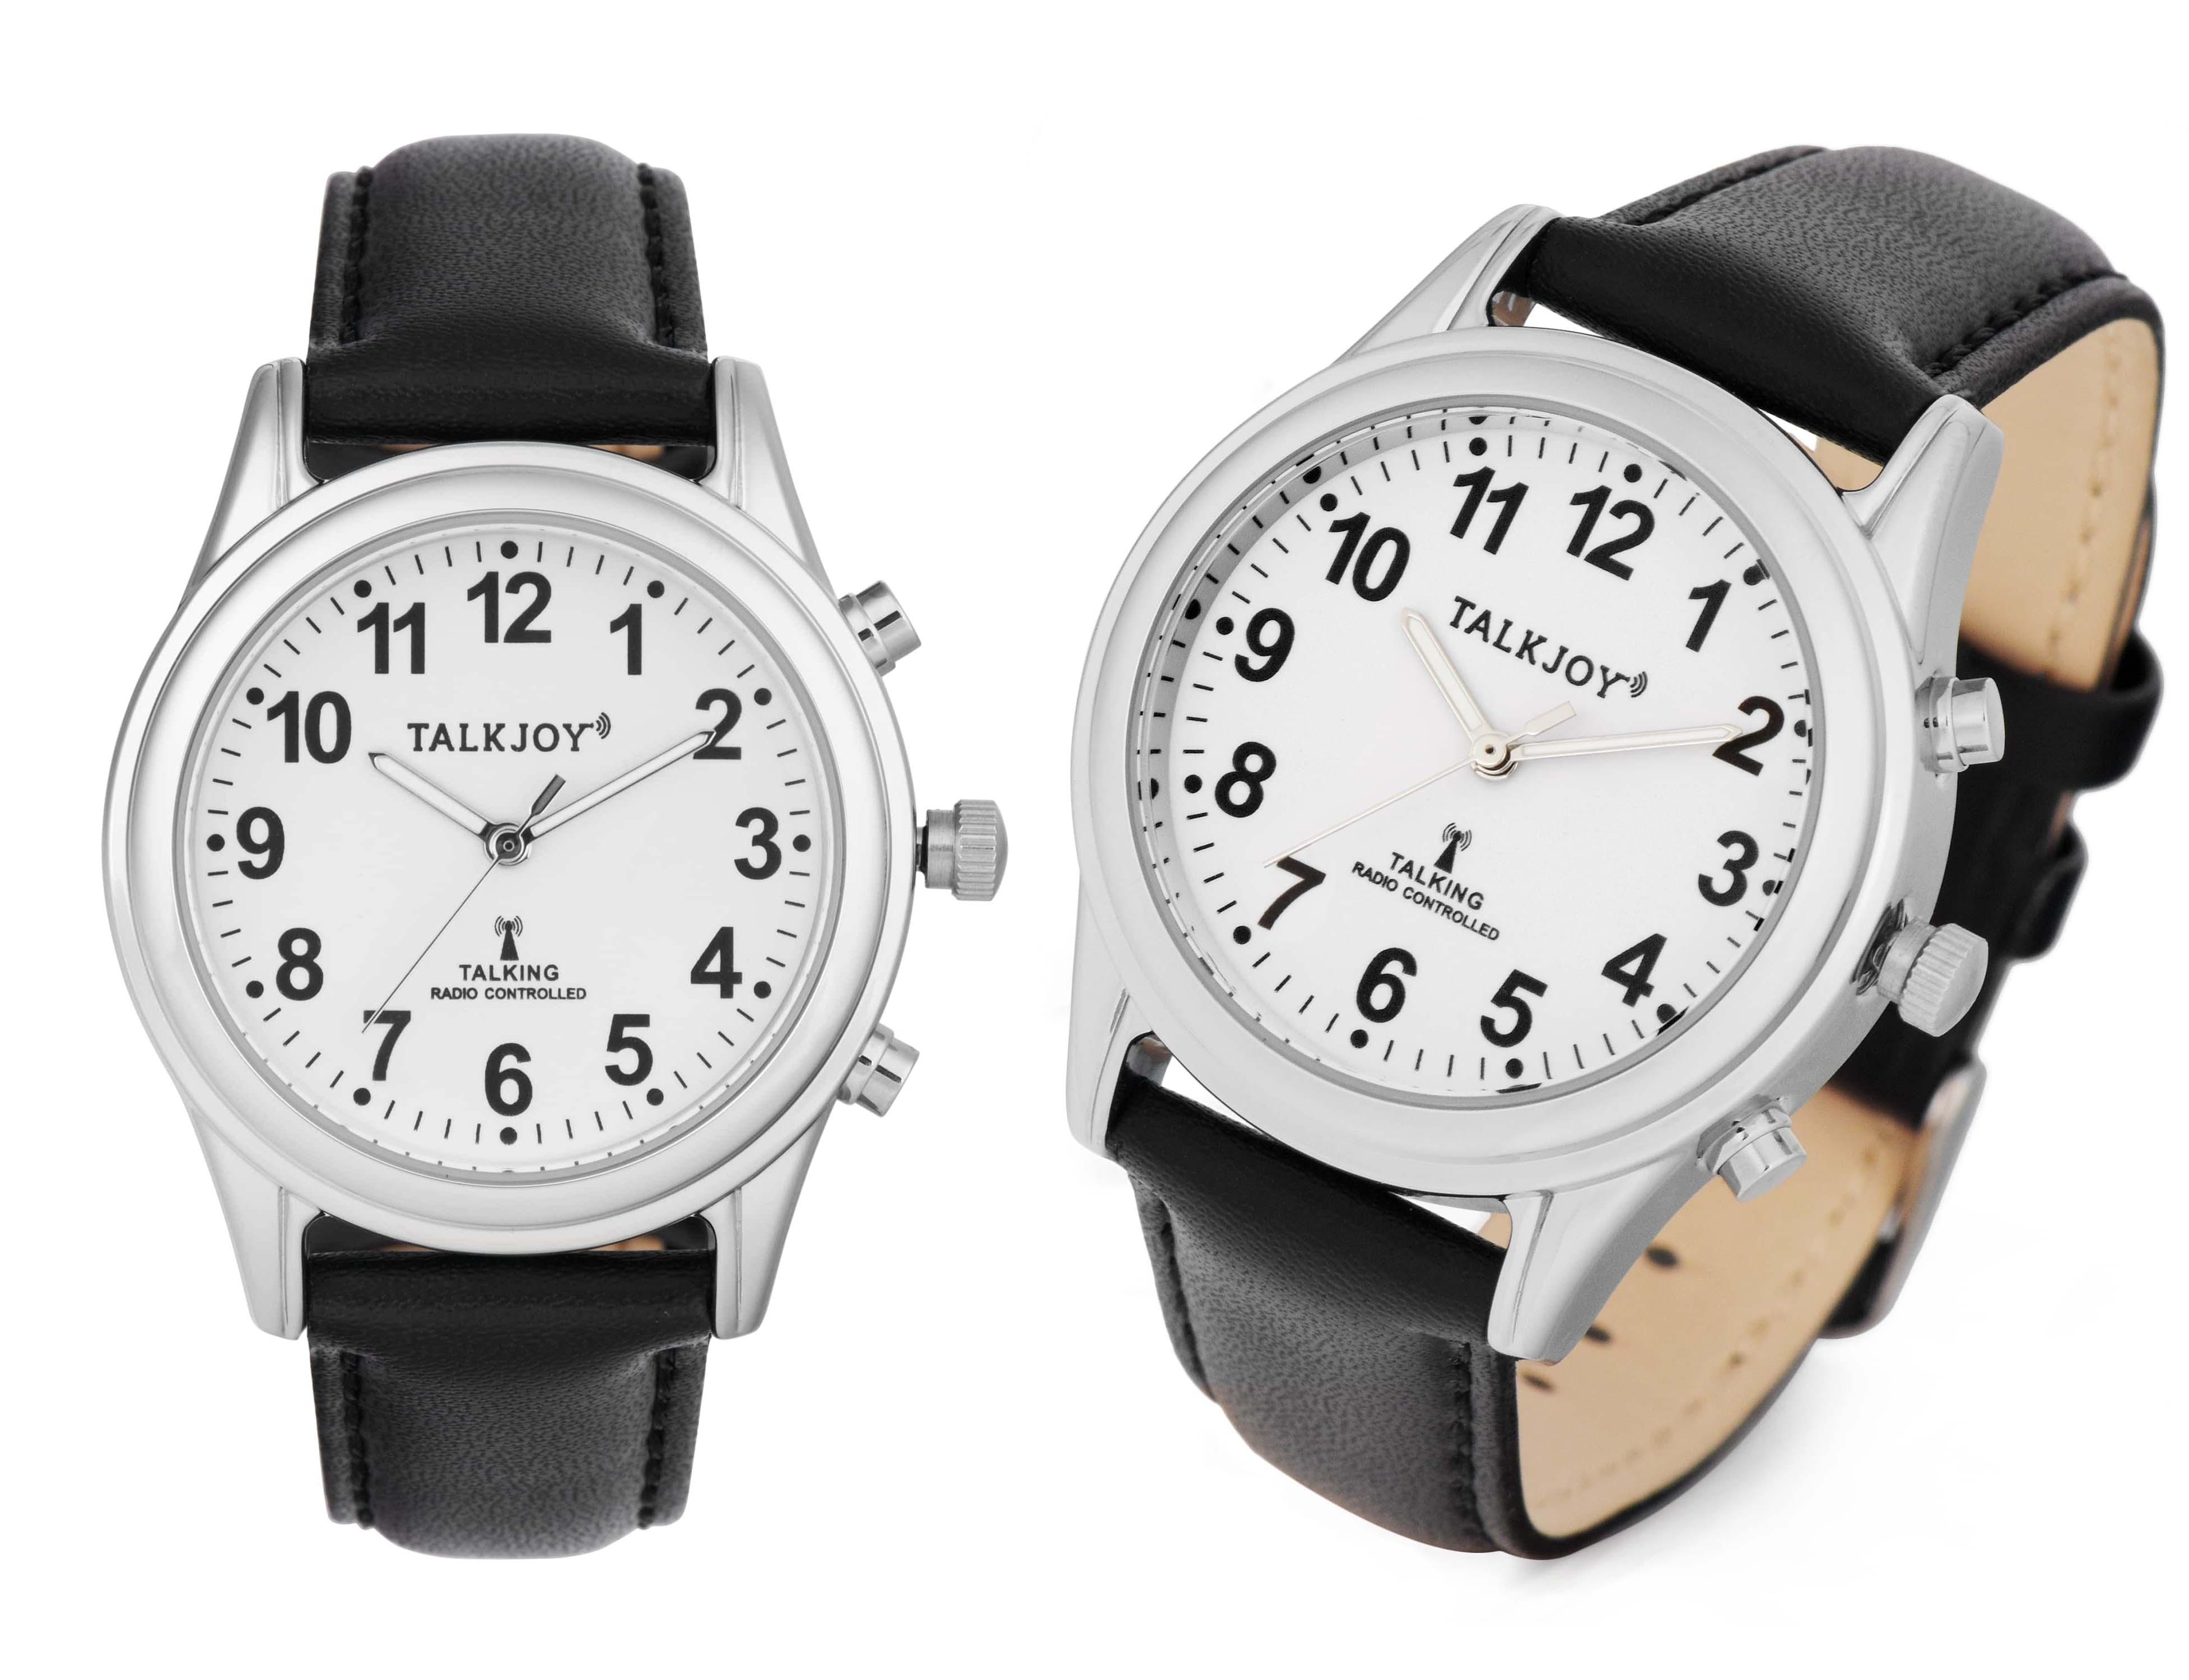 PRO DAMEN Sprechende Armbanduhr Uhr Funkuhr Lederarmband Seniorenuhr Blindenuhr